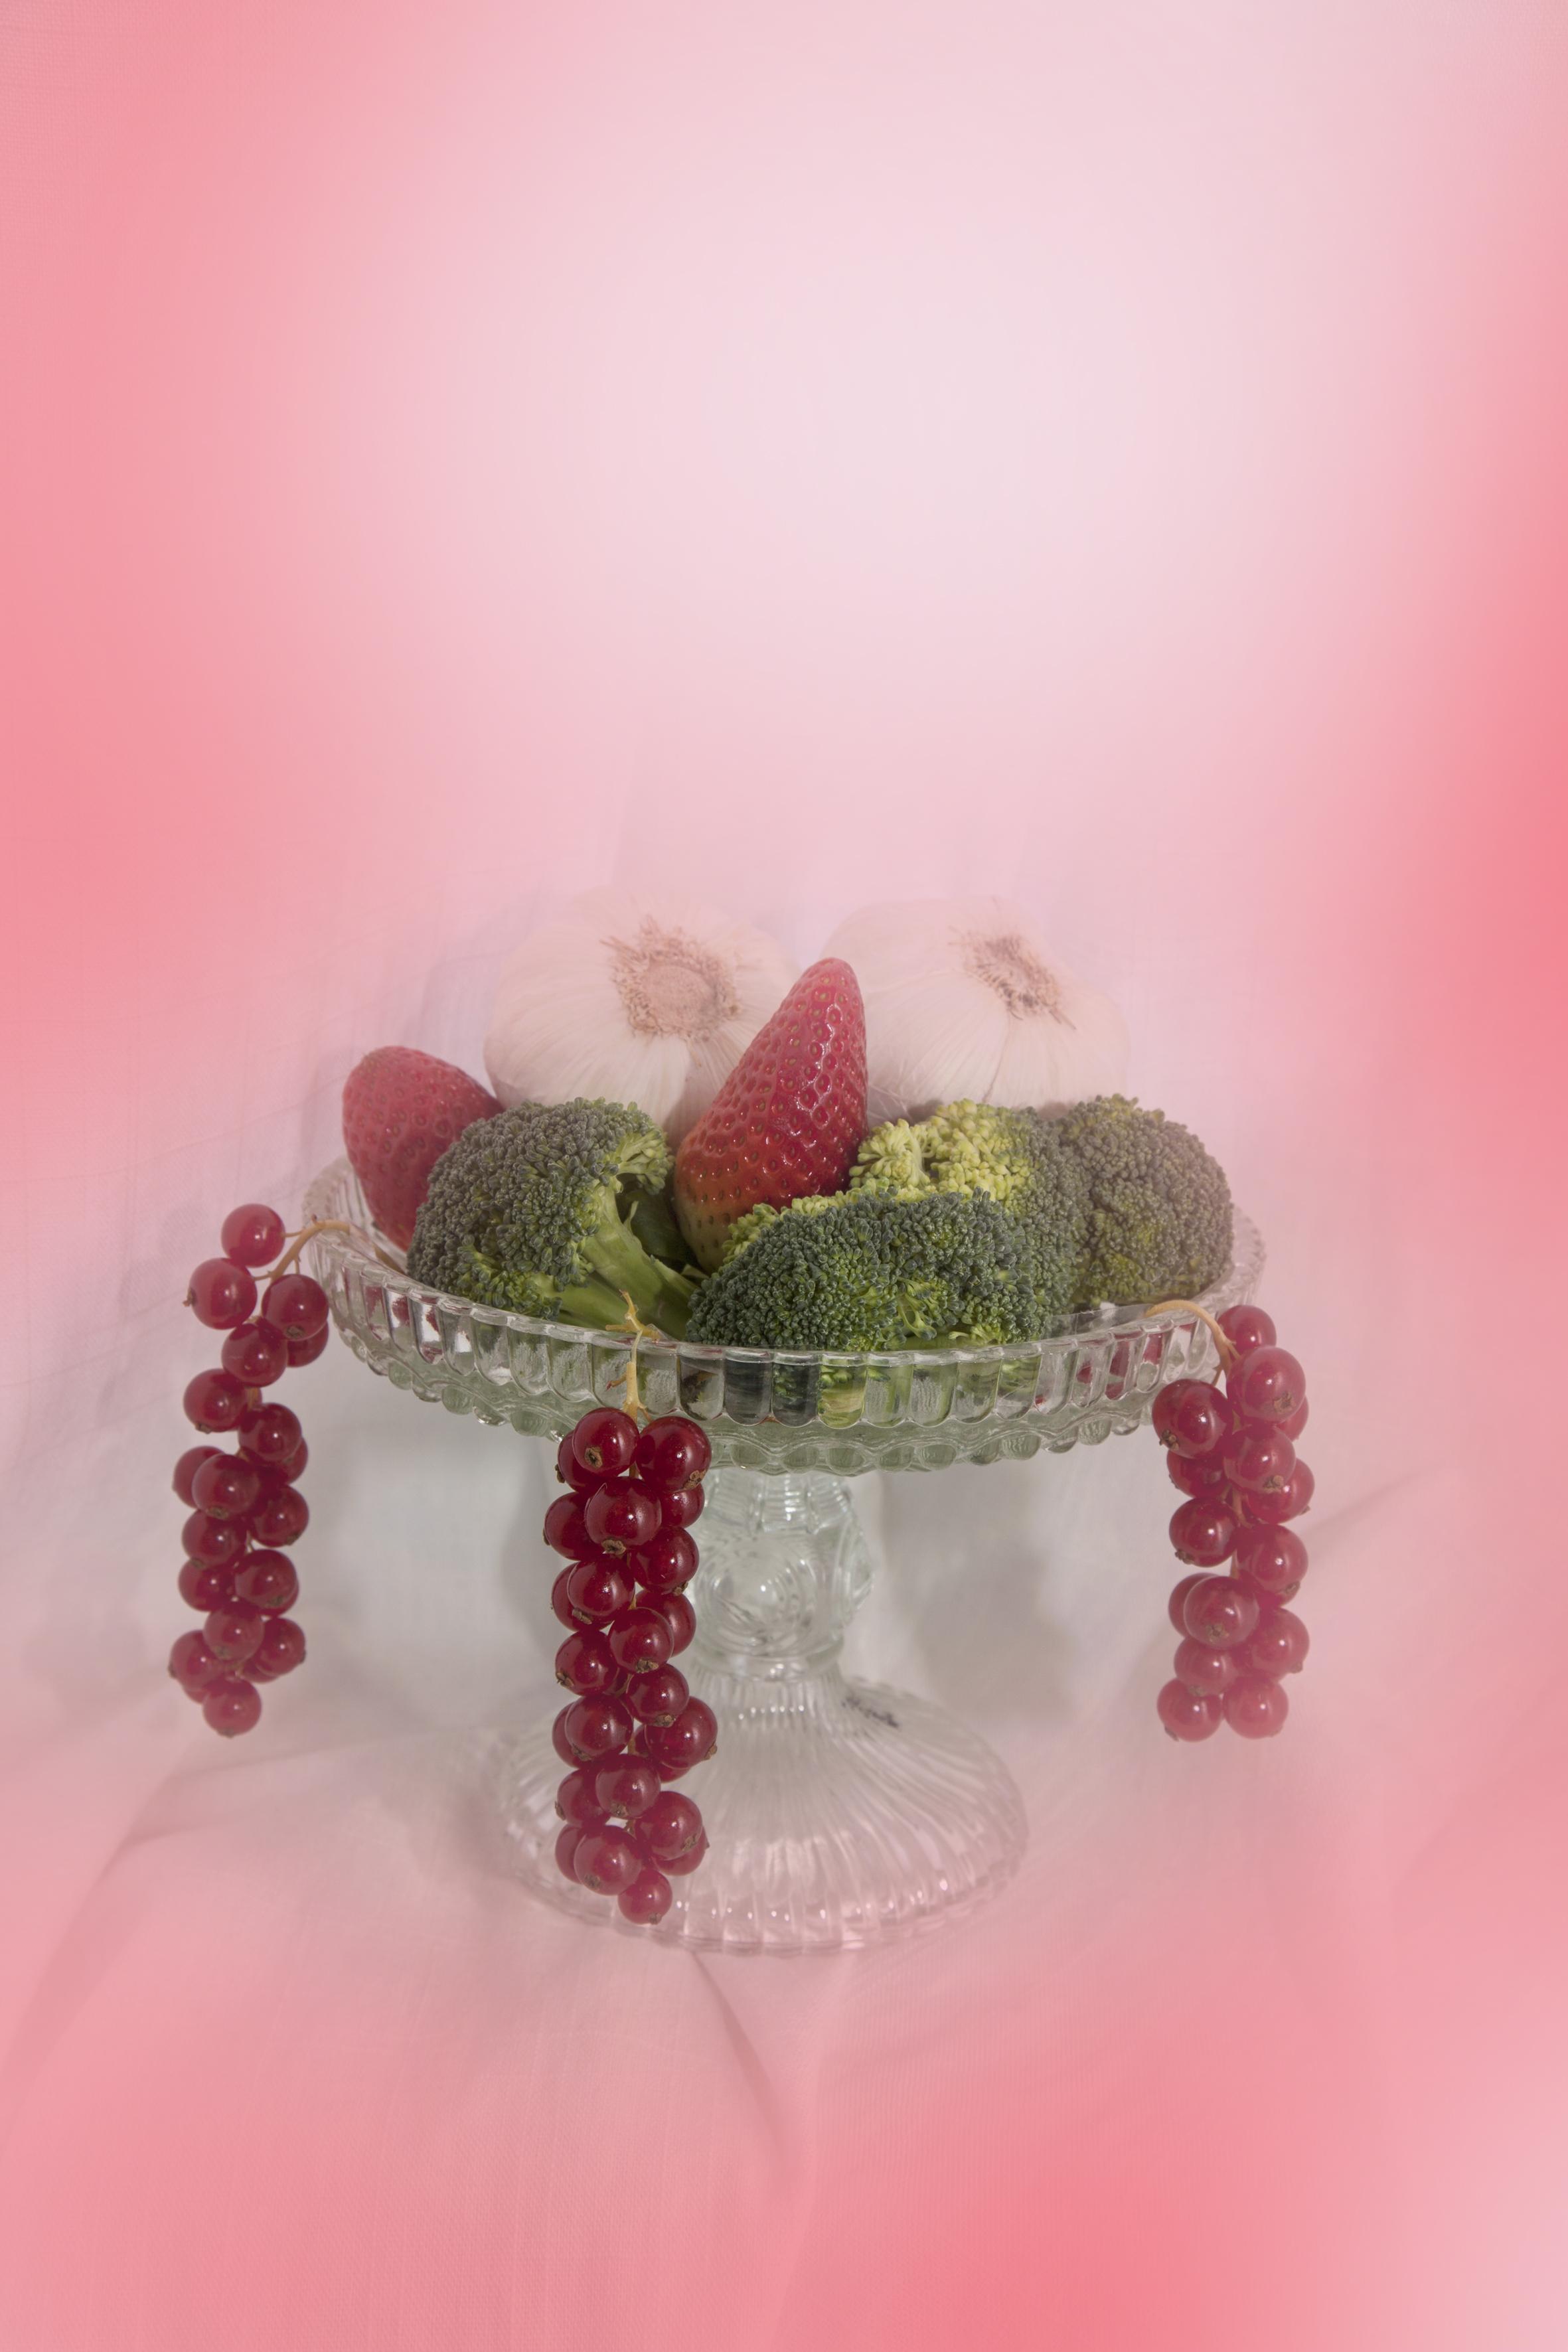 Stilllife Garlic and Berries